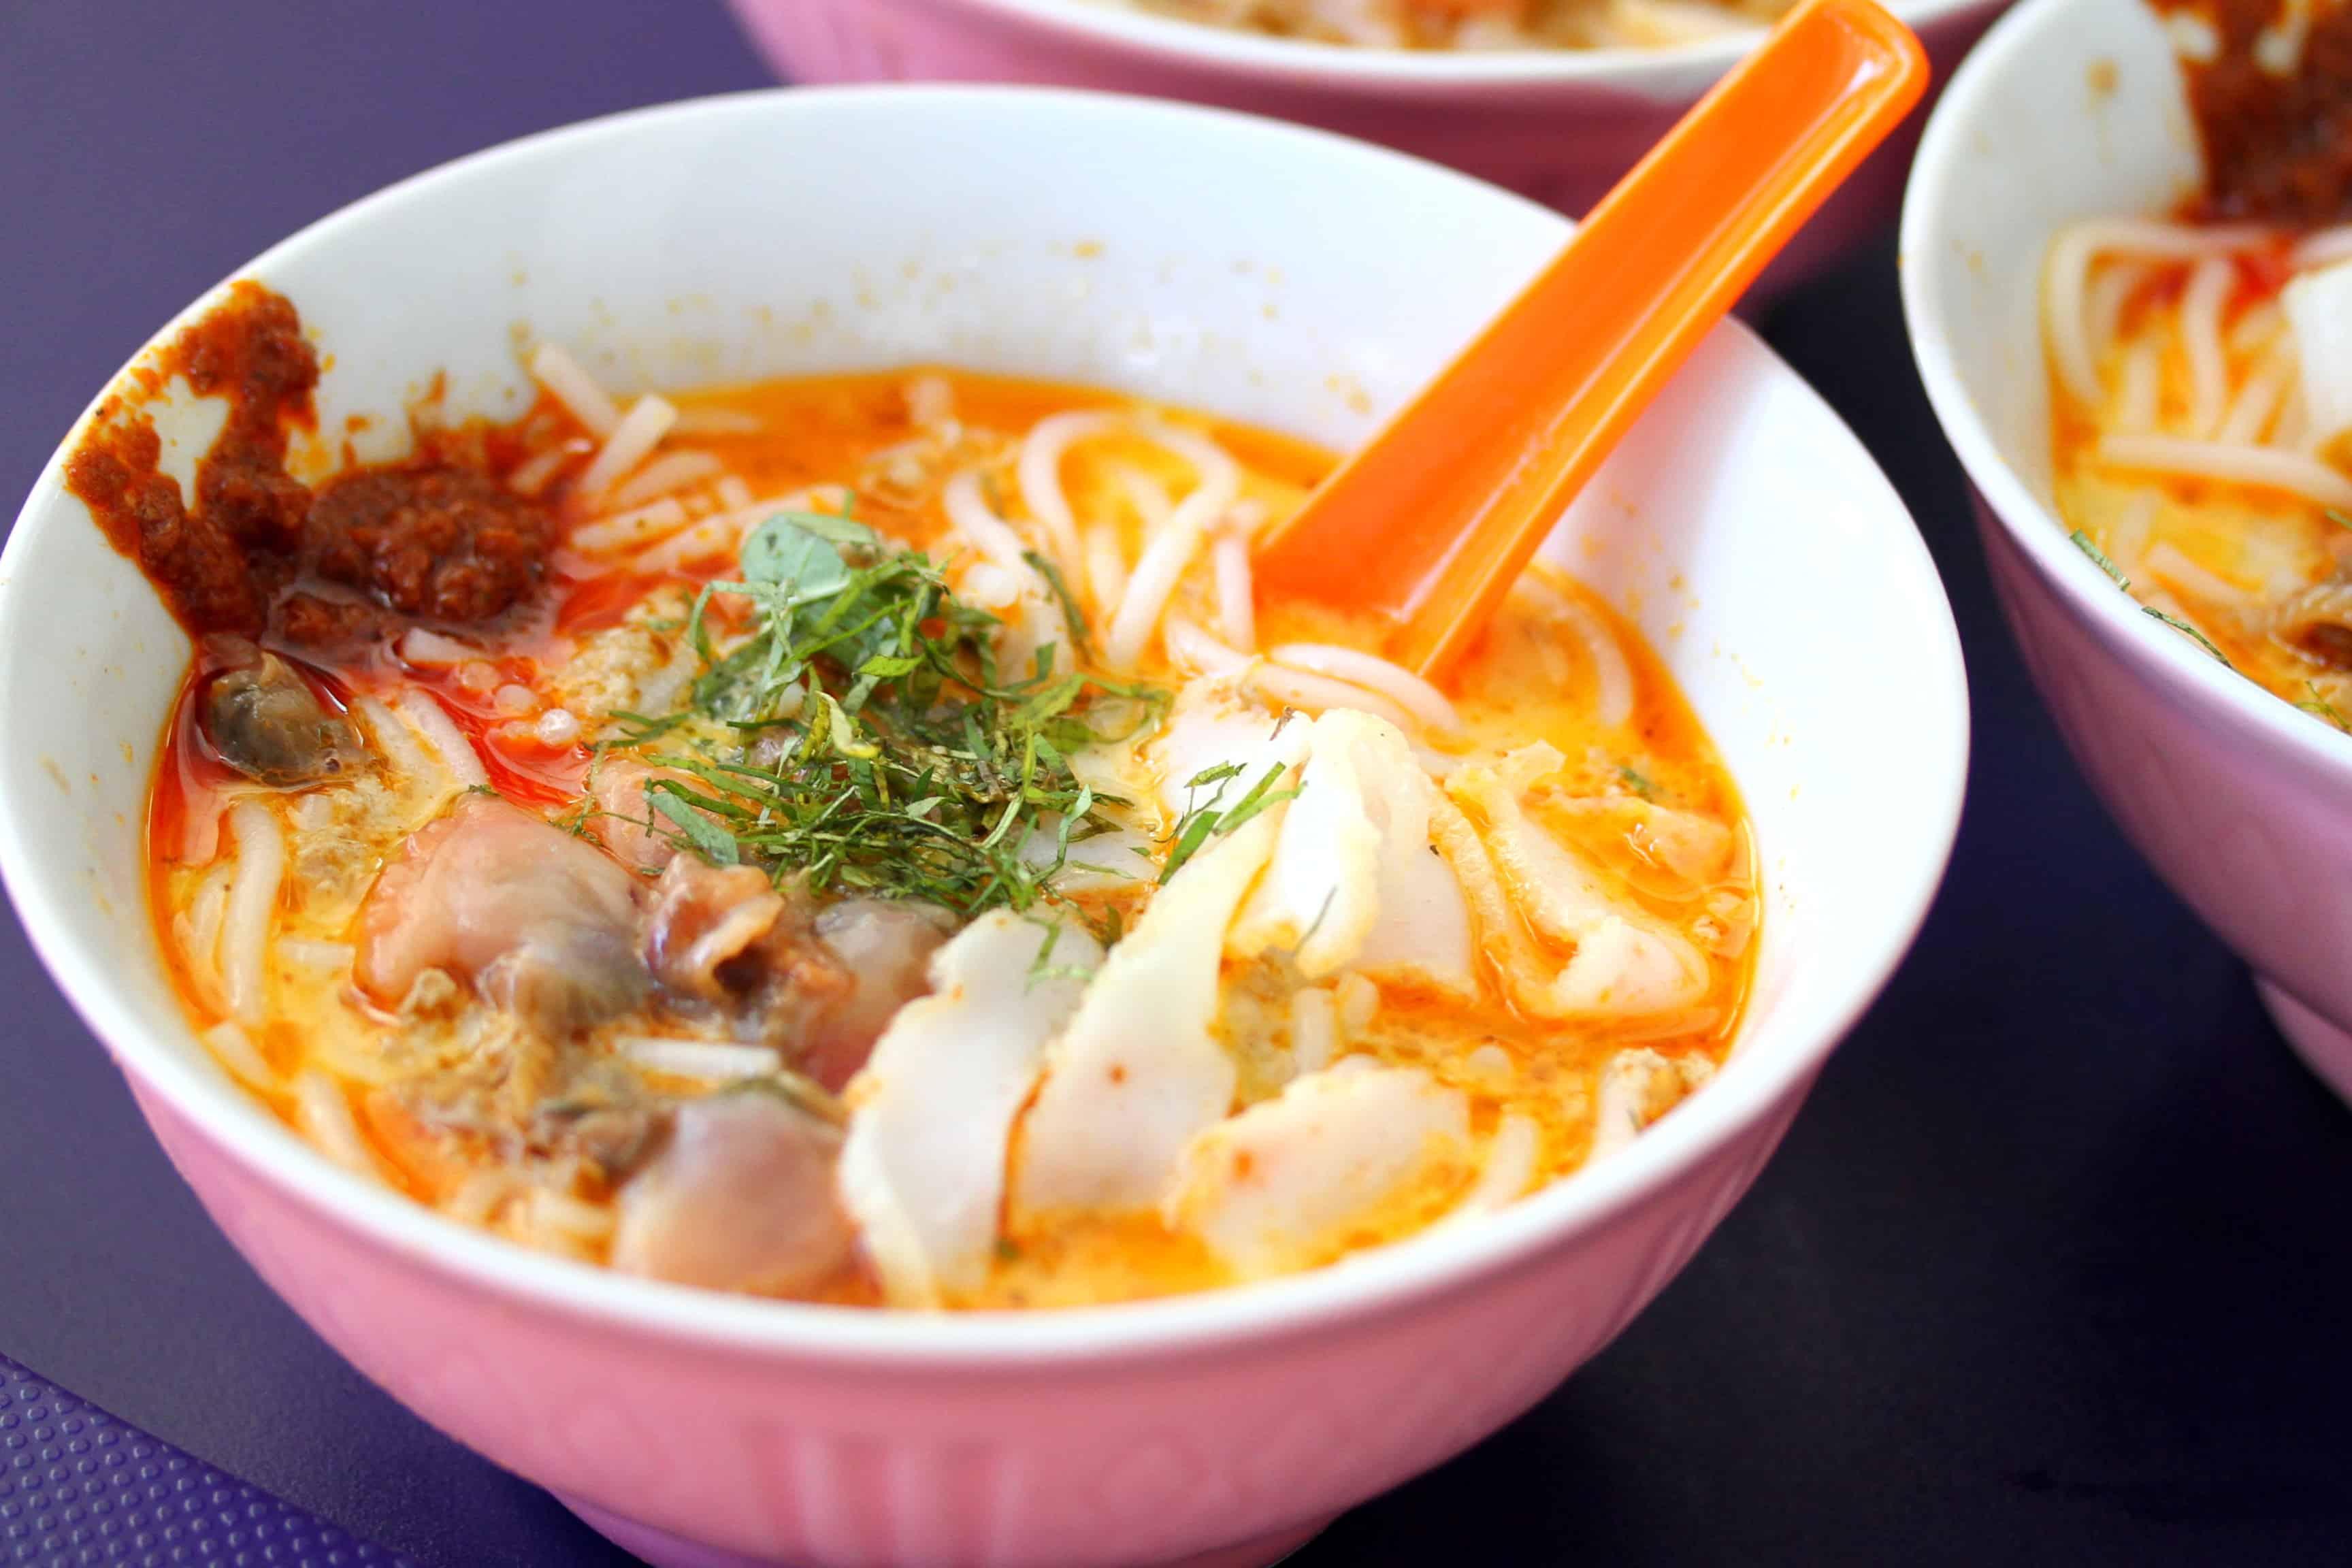 Sungei Road Laksa - Old School $3 Laksa at Jalan Berseh Review